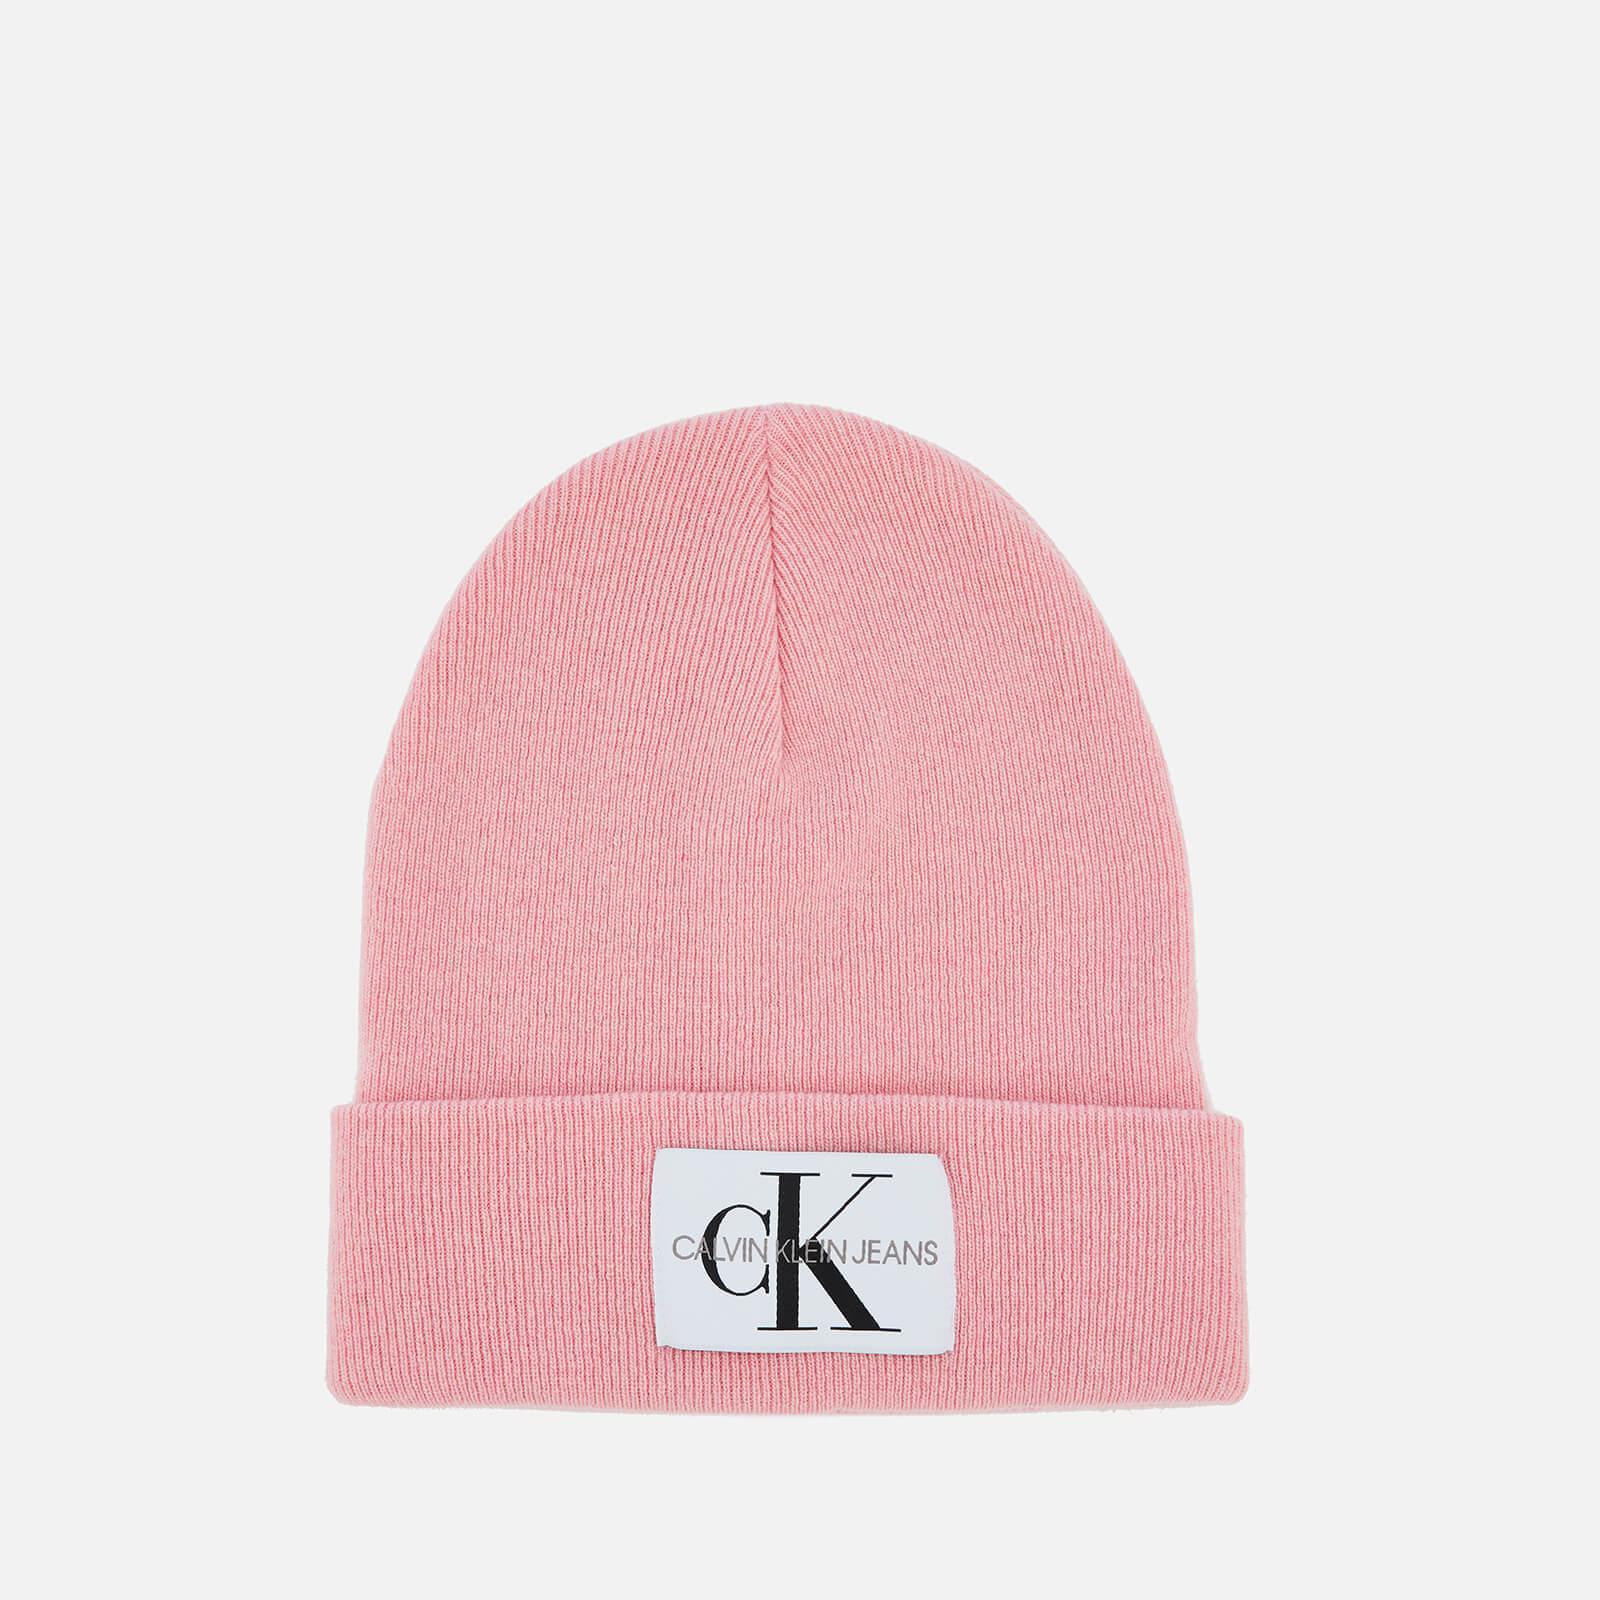 68ad51f592e Calvin Klein Wool Blend Logo Beanie in Pink - Lyst